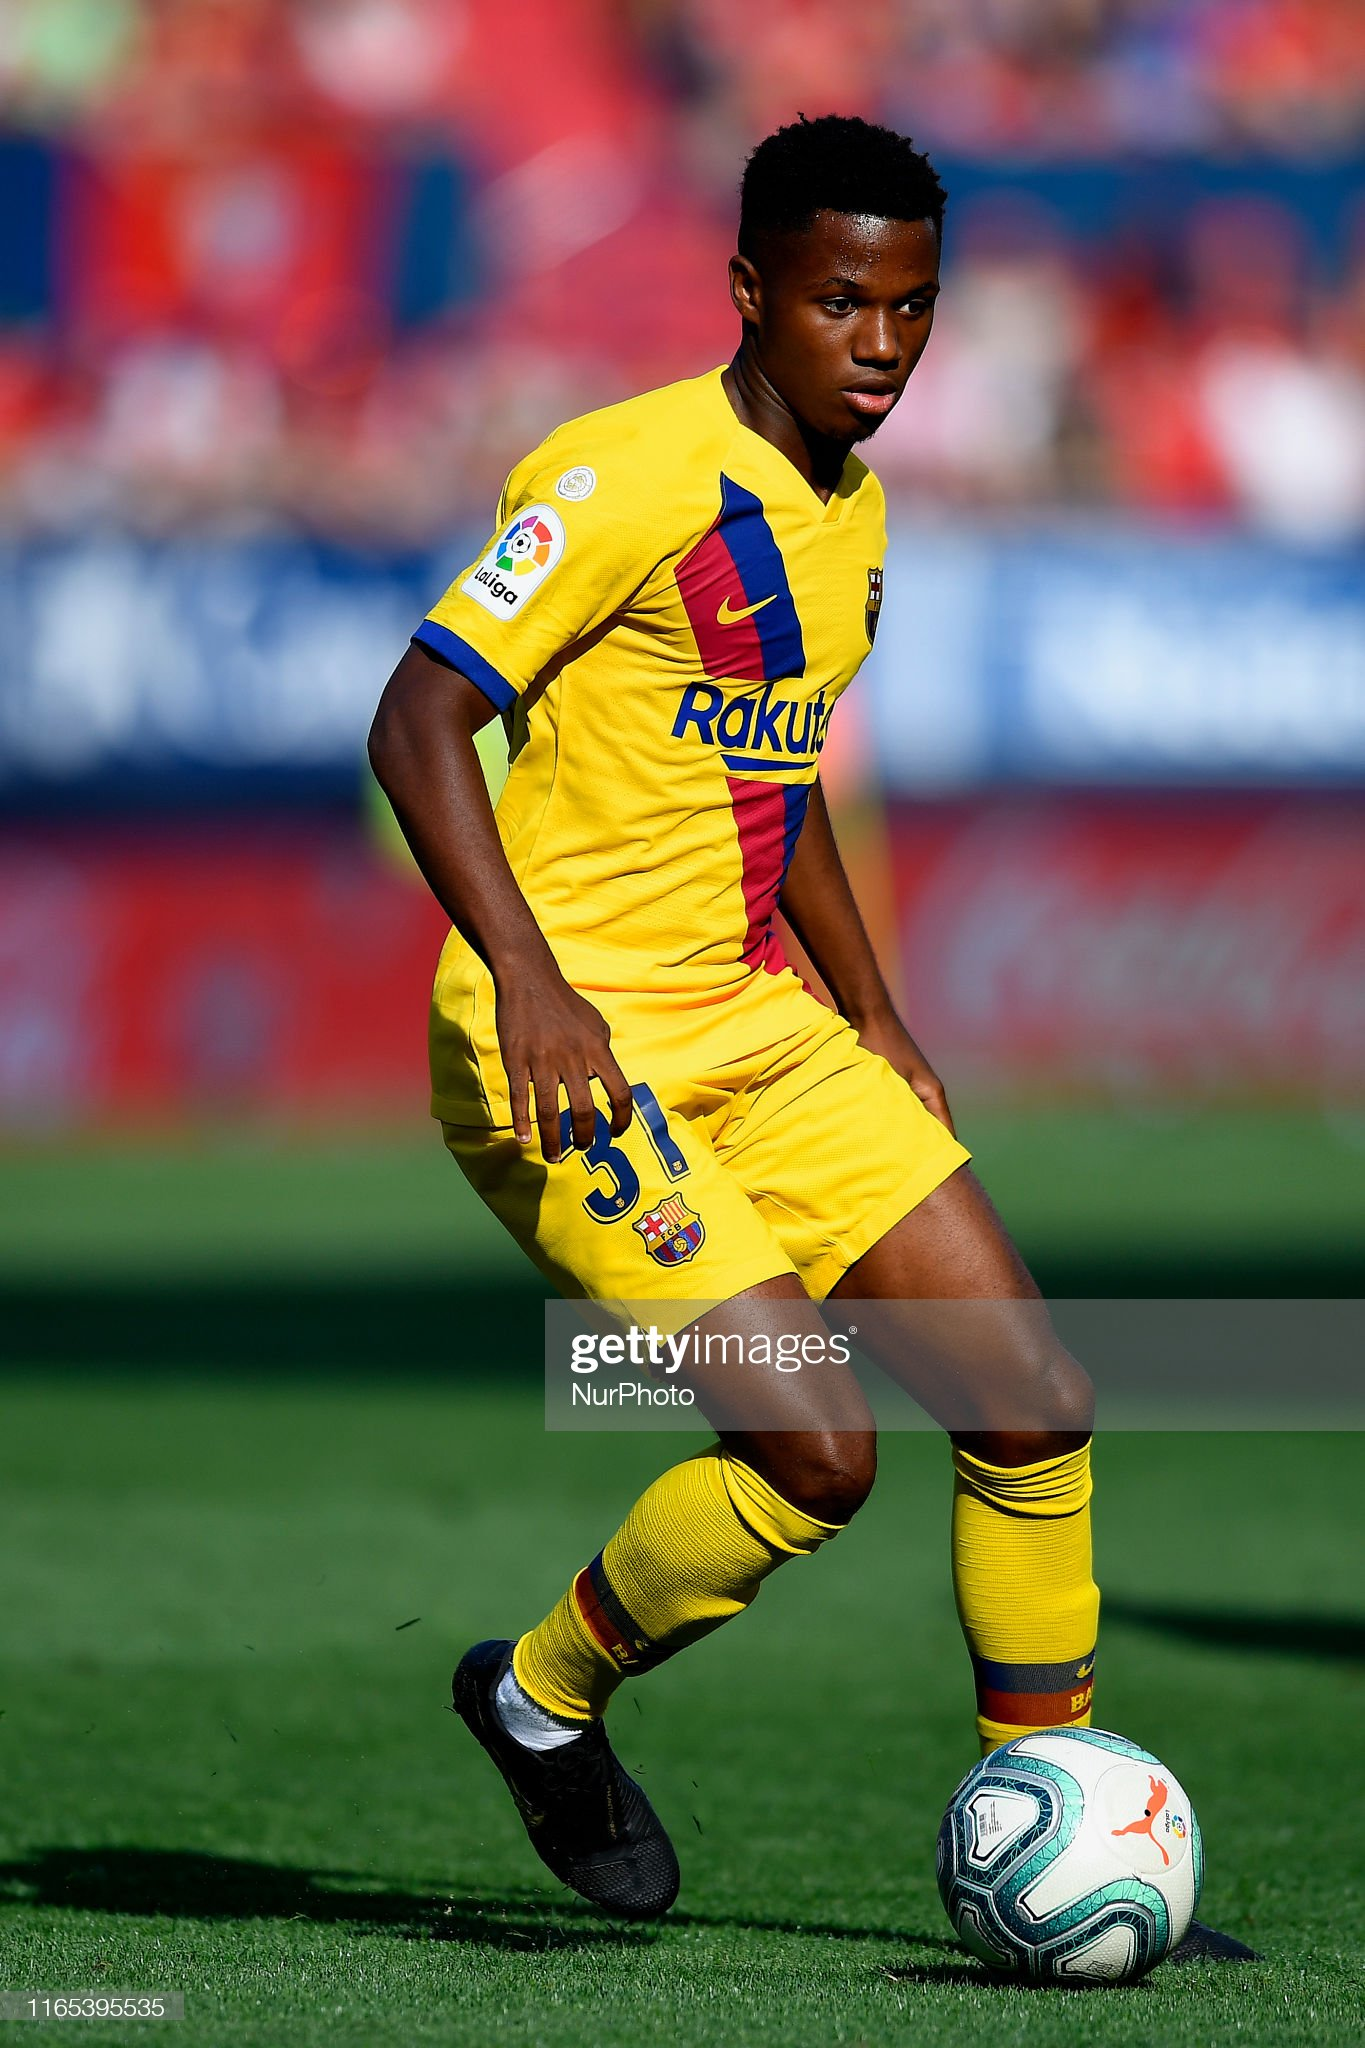 صور مباراة : أوساسونا - برشلونة 2-2 ( 31-08-2019 )  Ansu-fati-of-barcelona-in-aciton-during-the-liga-match-between-ca-picture-id1165395535?s=2048x2048